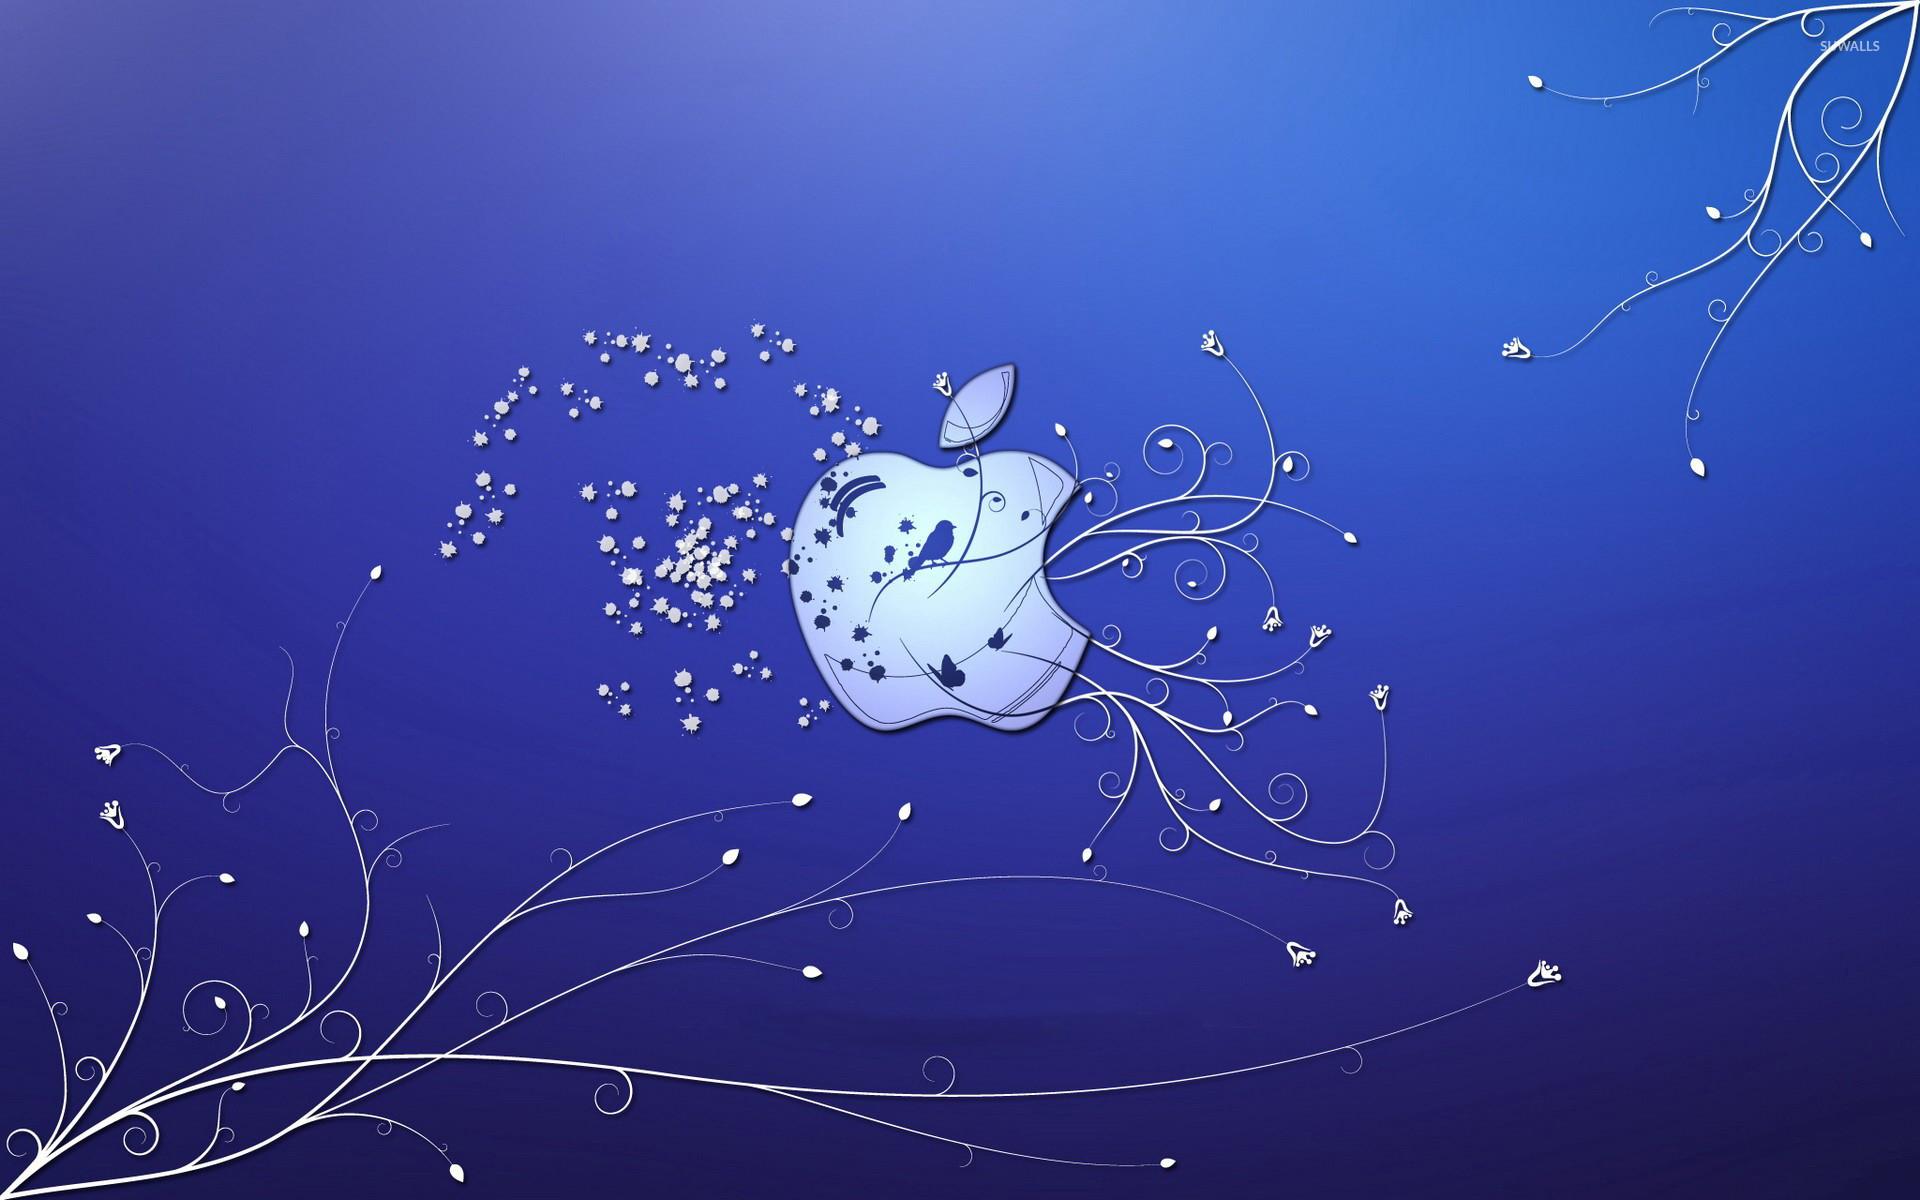 Bird and butterflies in the Apple wallpaper jpg